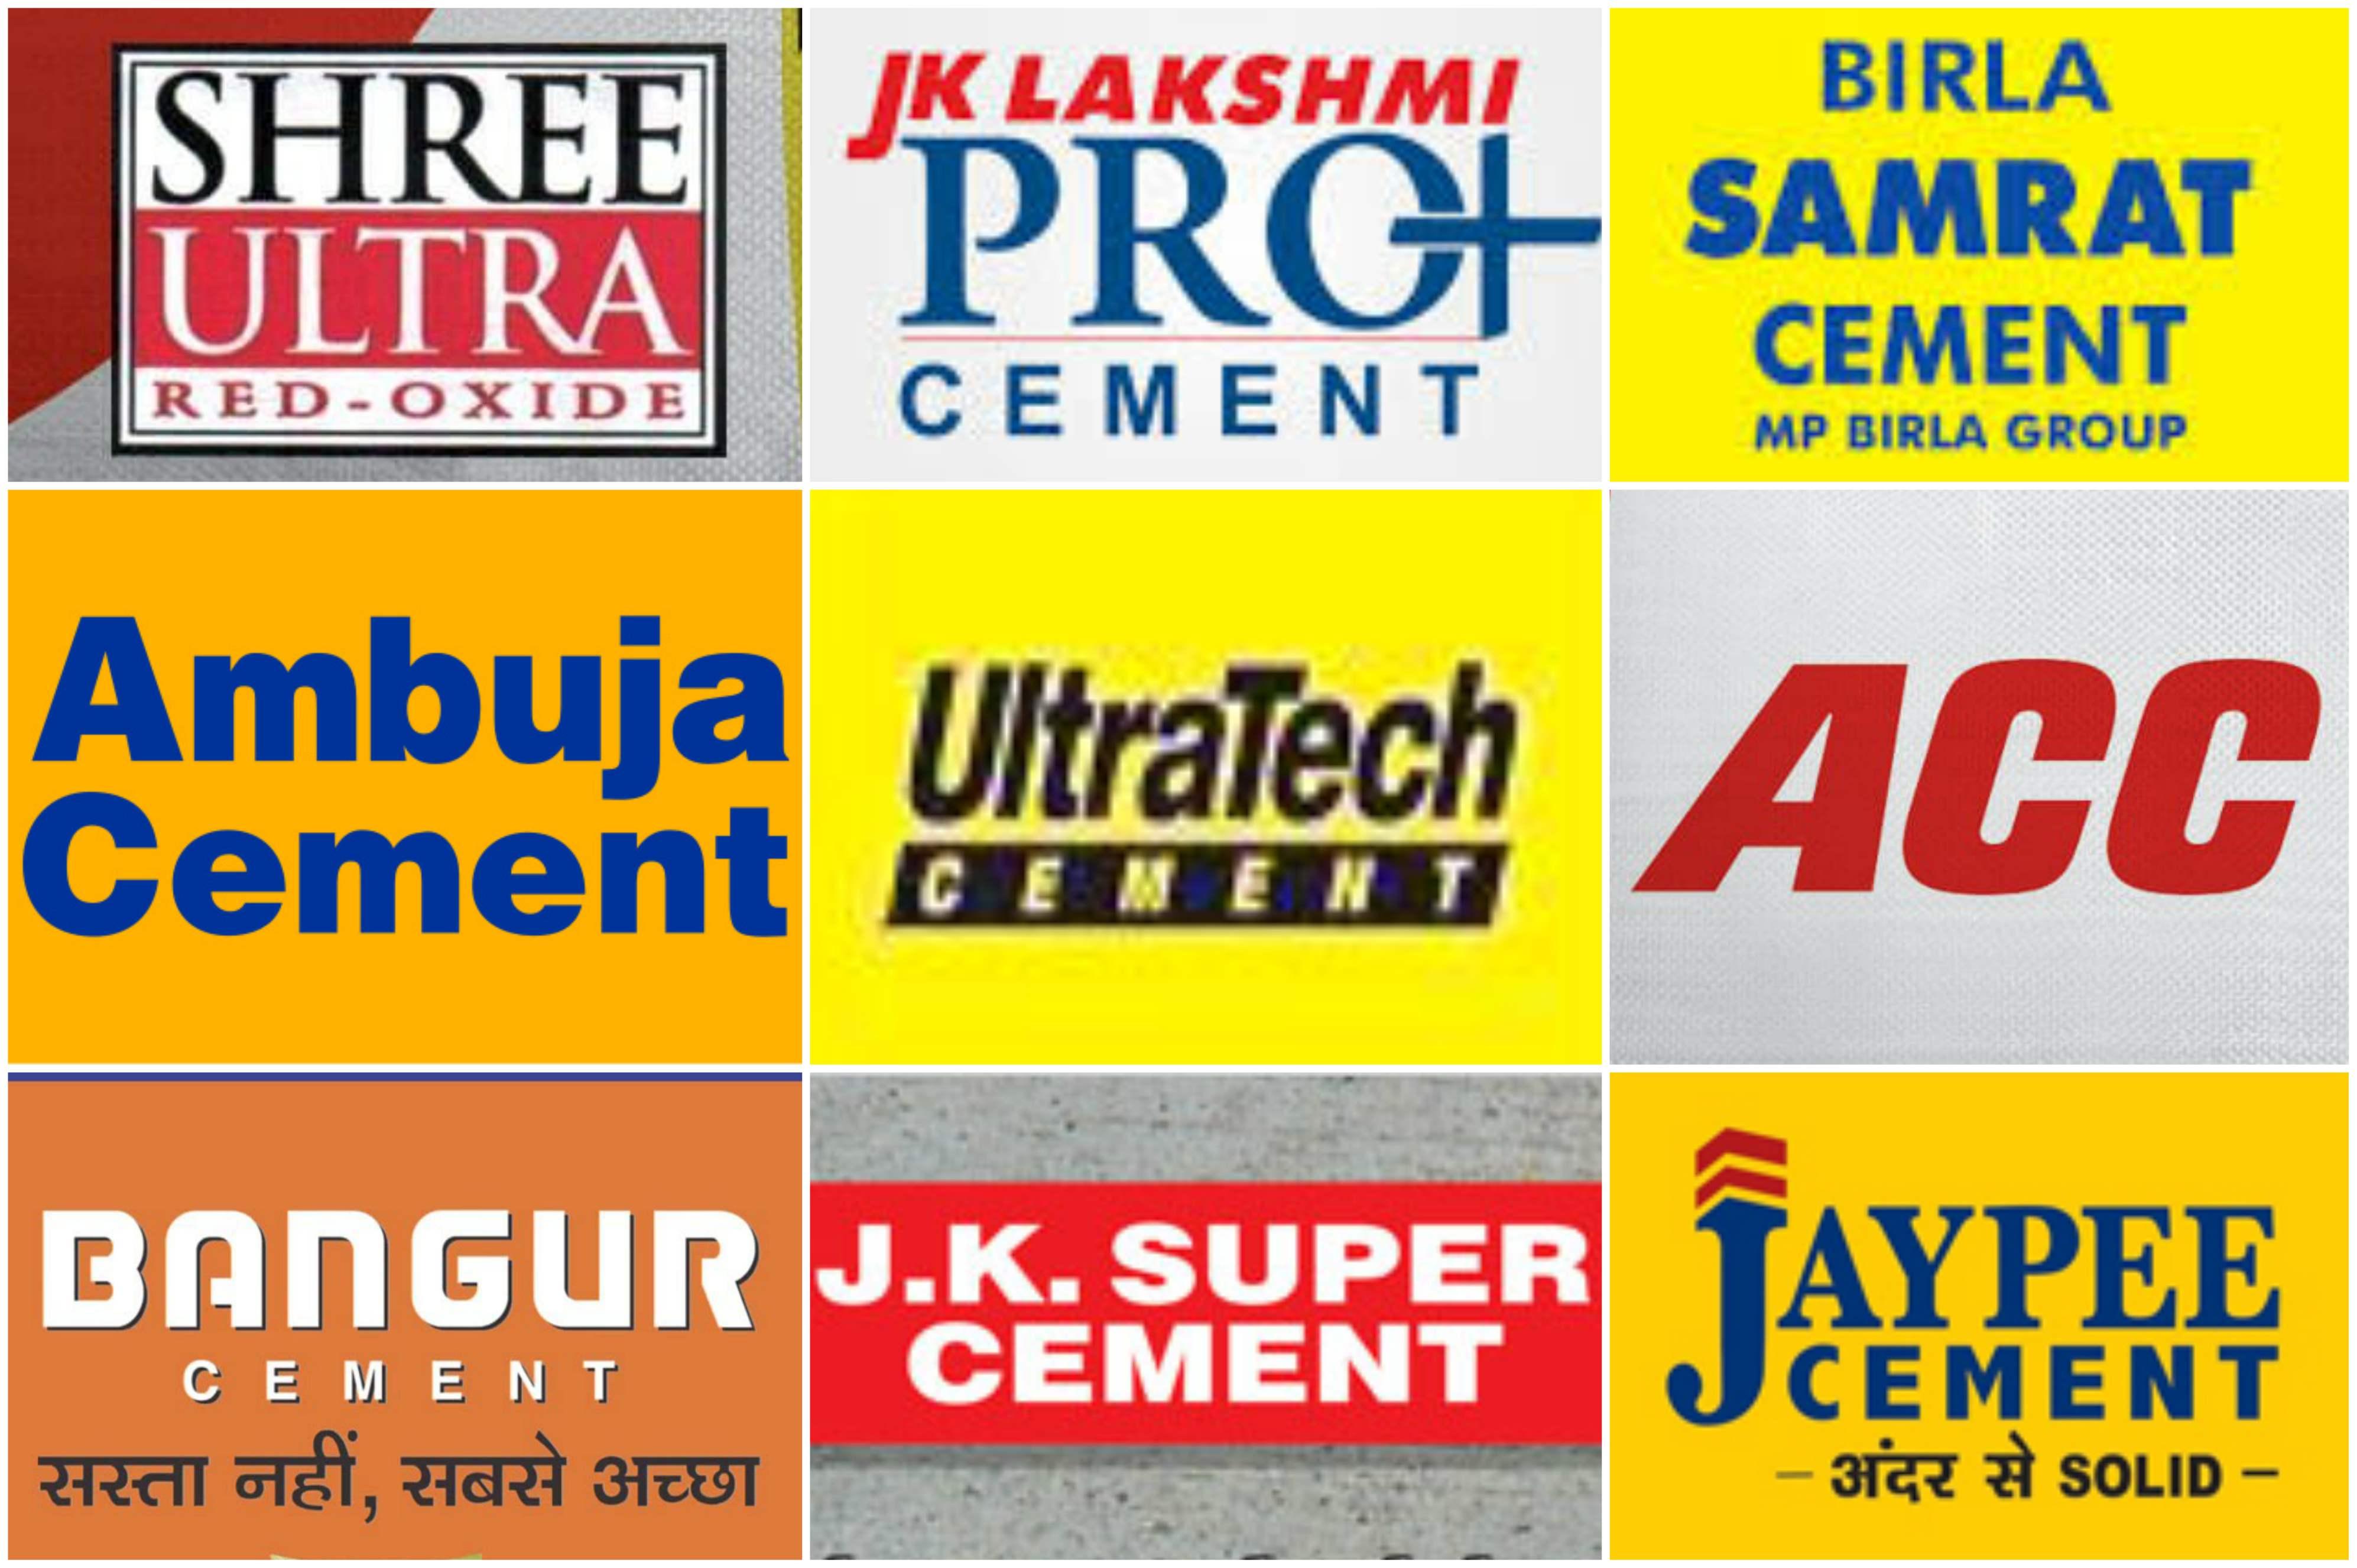 RG Enterprises | Cement Dealer | Cement Wholesaler Price | Buy Cement Online Phone No - 9958658867 || Noida-Ghaziabad-NCR-Greater-Noida